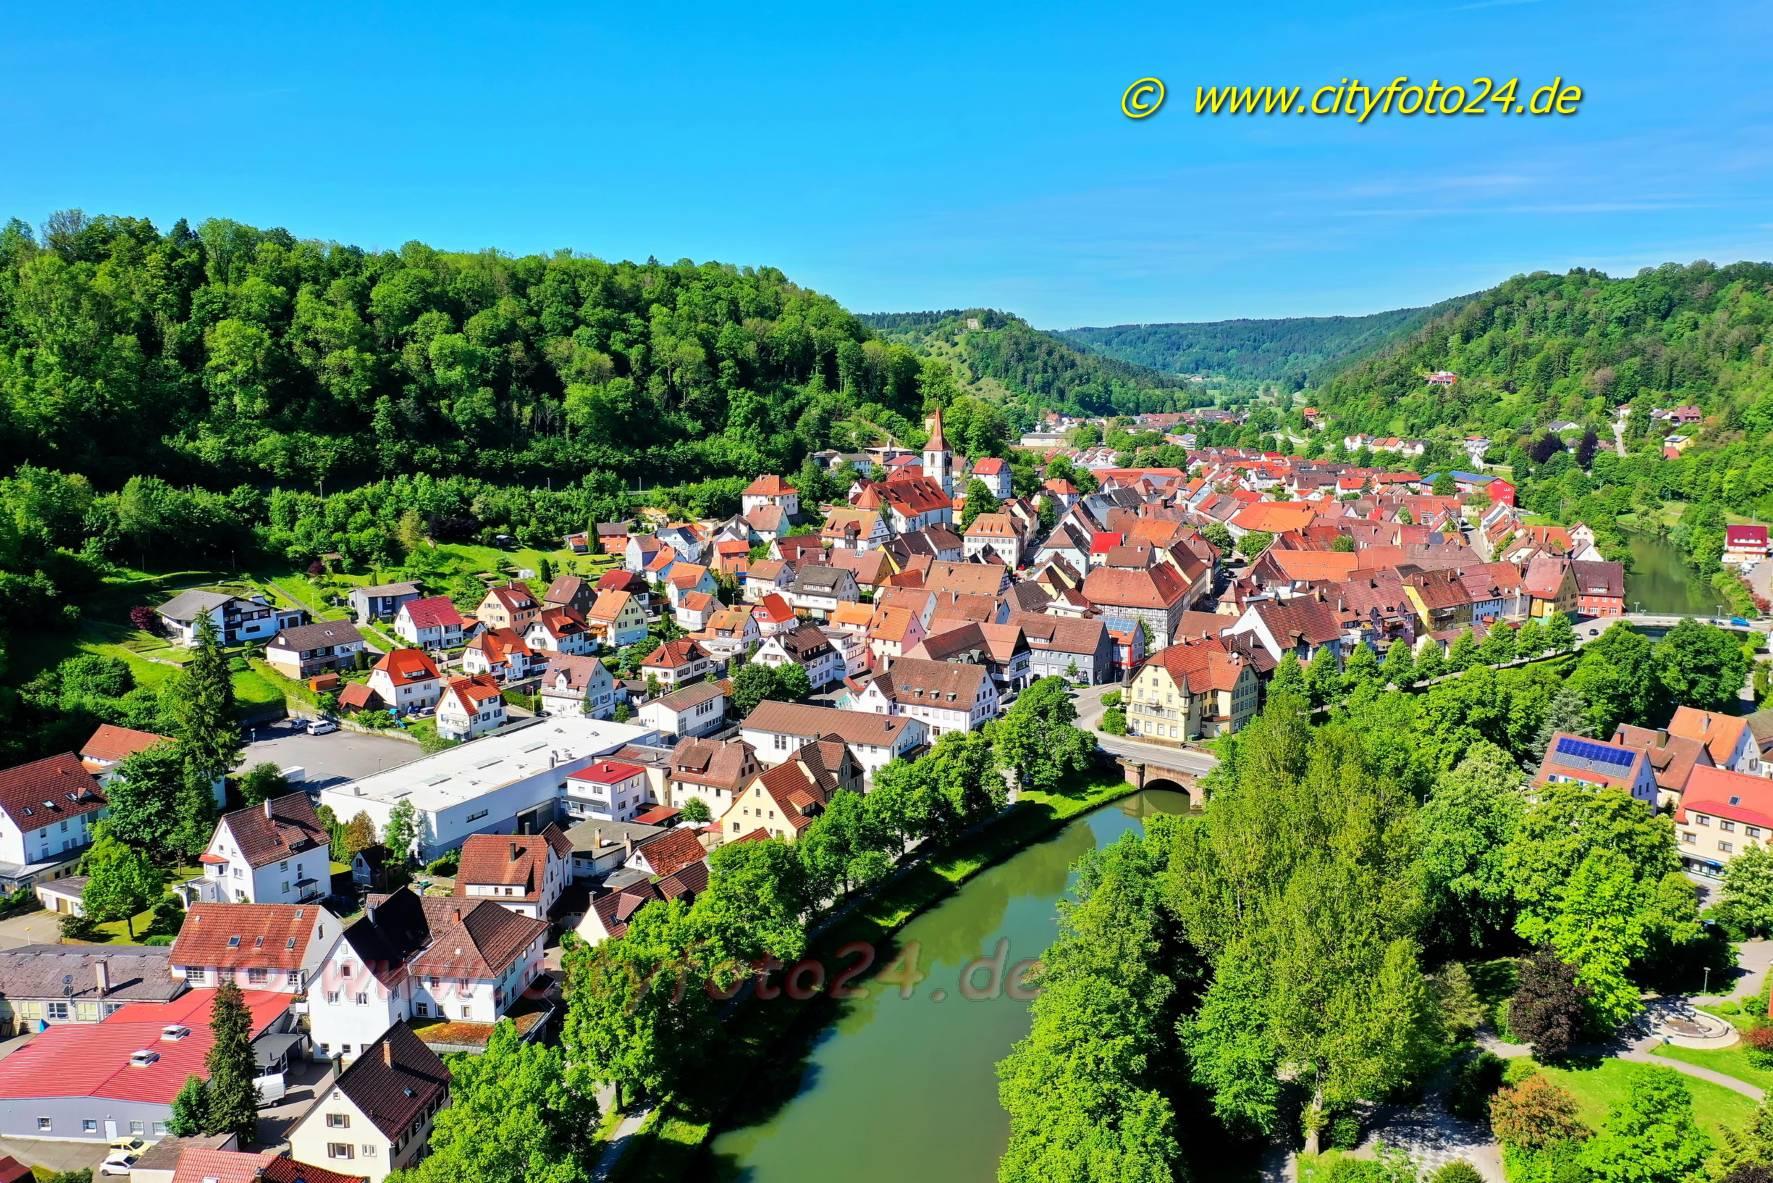 cityfoto24 - Sulz am Neckar